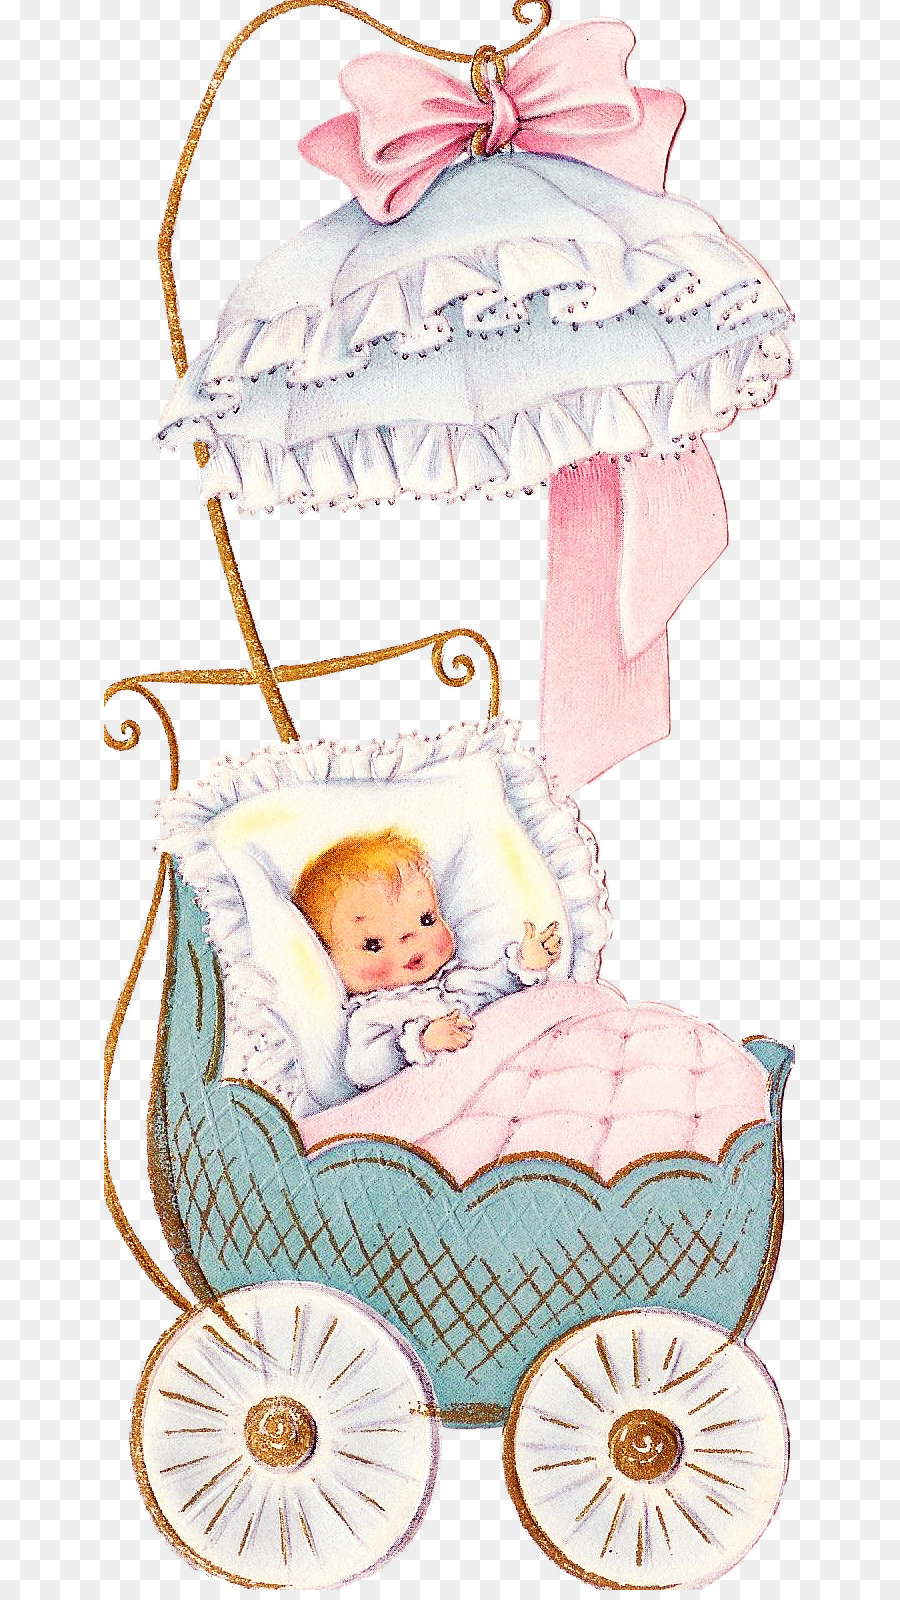 Тему, открытка с младенцем